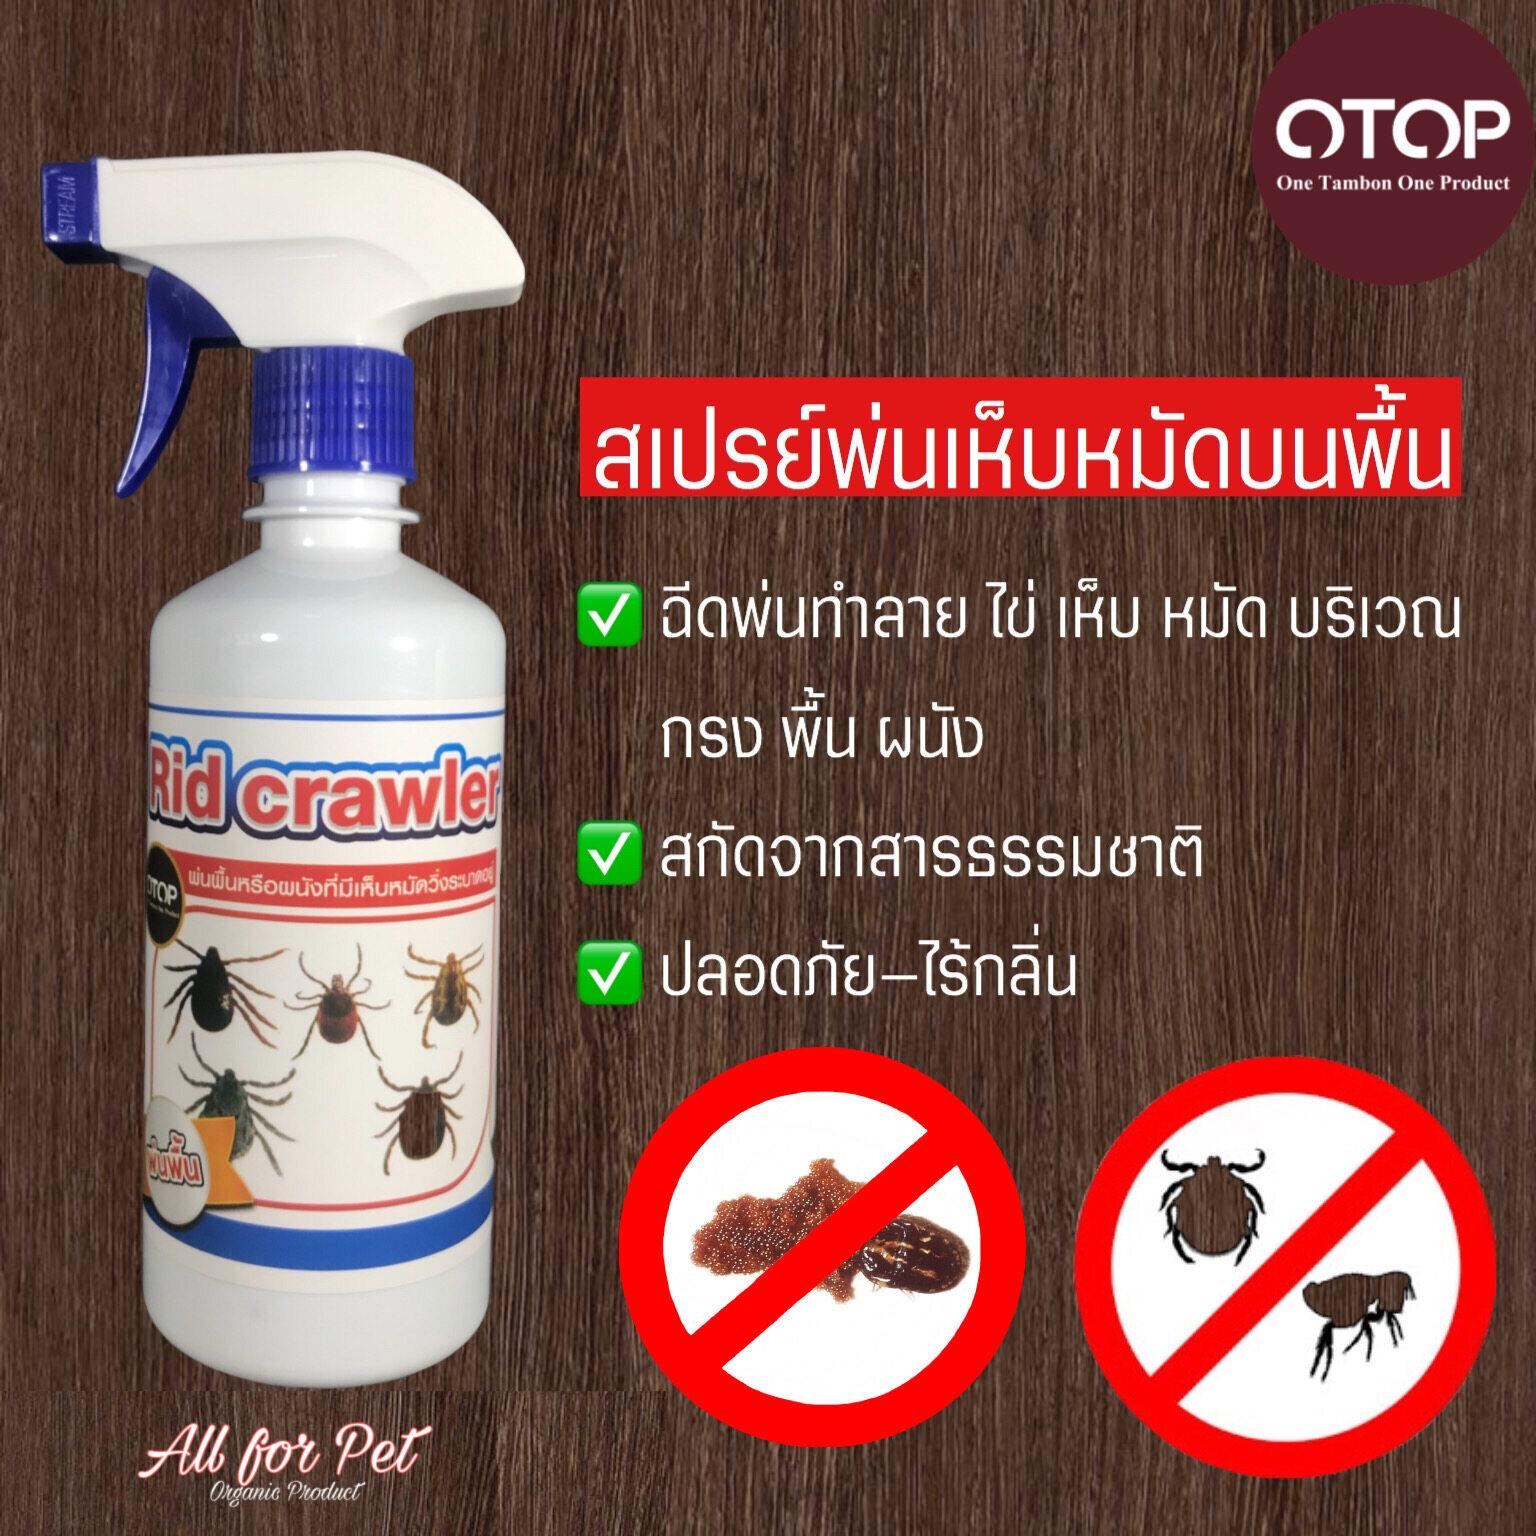 Rid Crawler สารอินทรีย์ป้องกัน เห็บหมัด ริ้น ไร บนพื้น ผนัง กรง By All For Pet ปริมาตร 450 Ml..